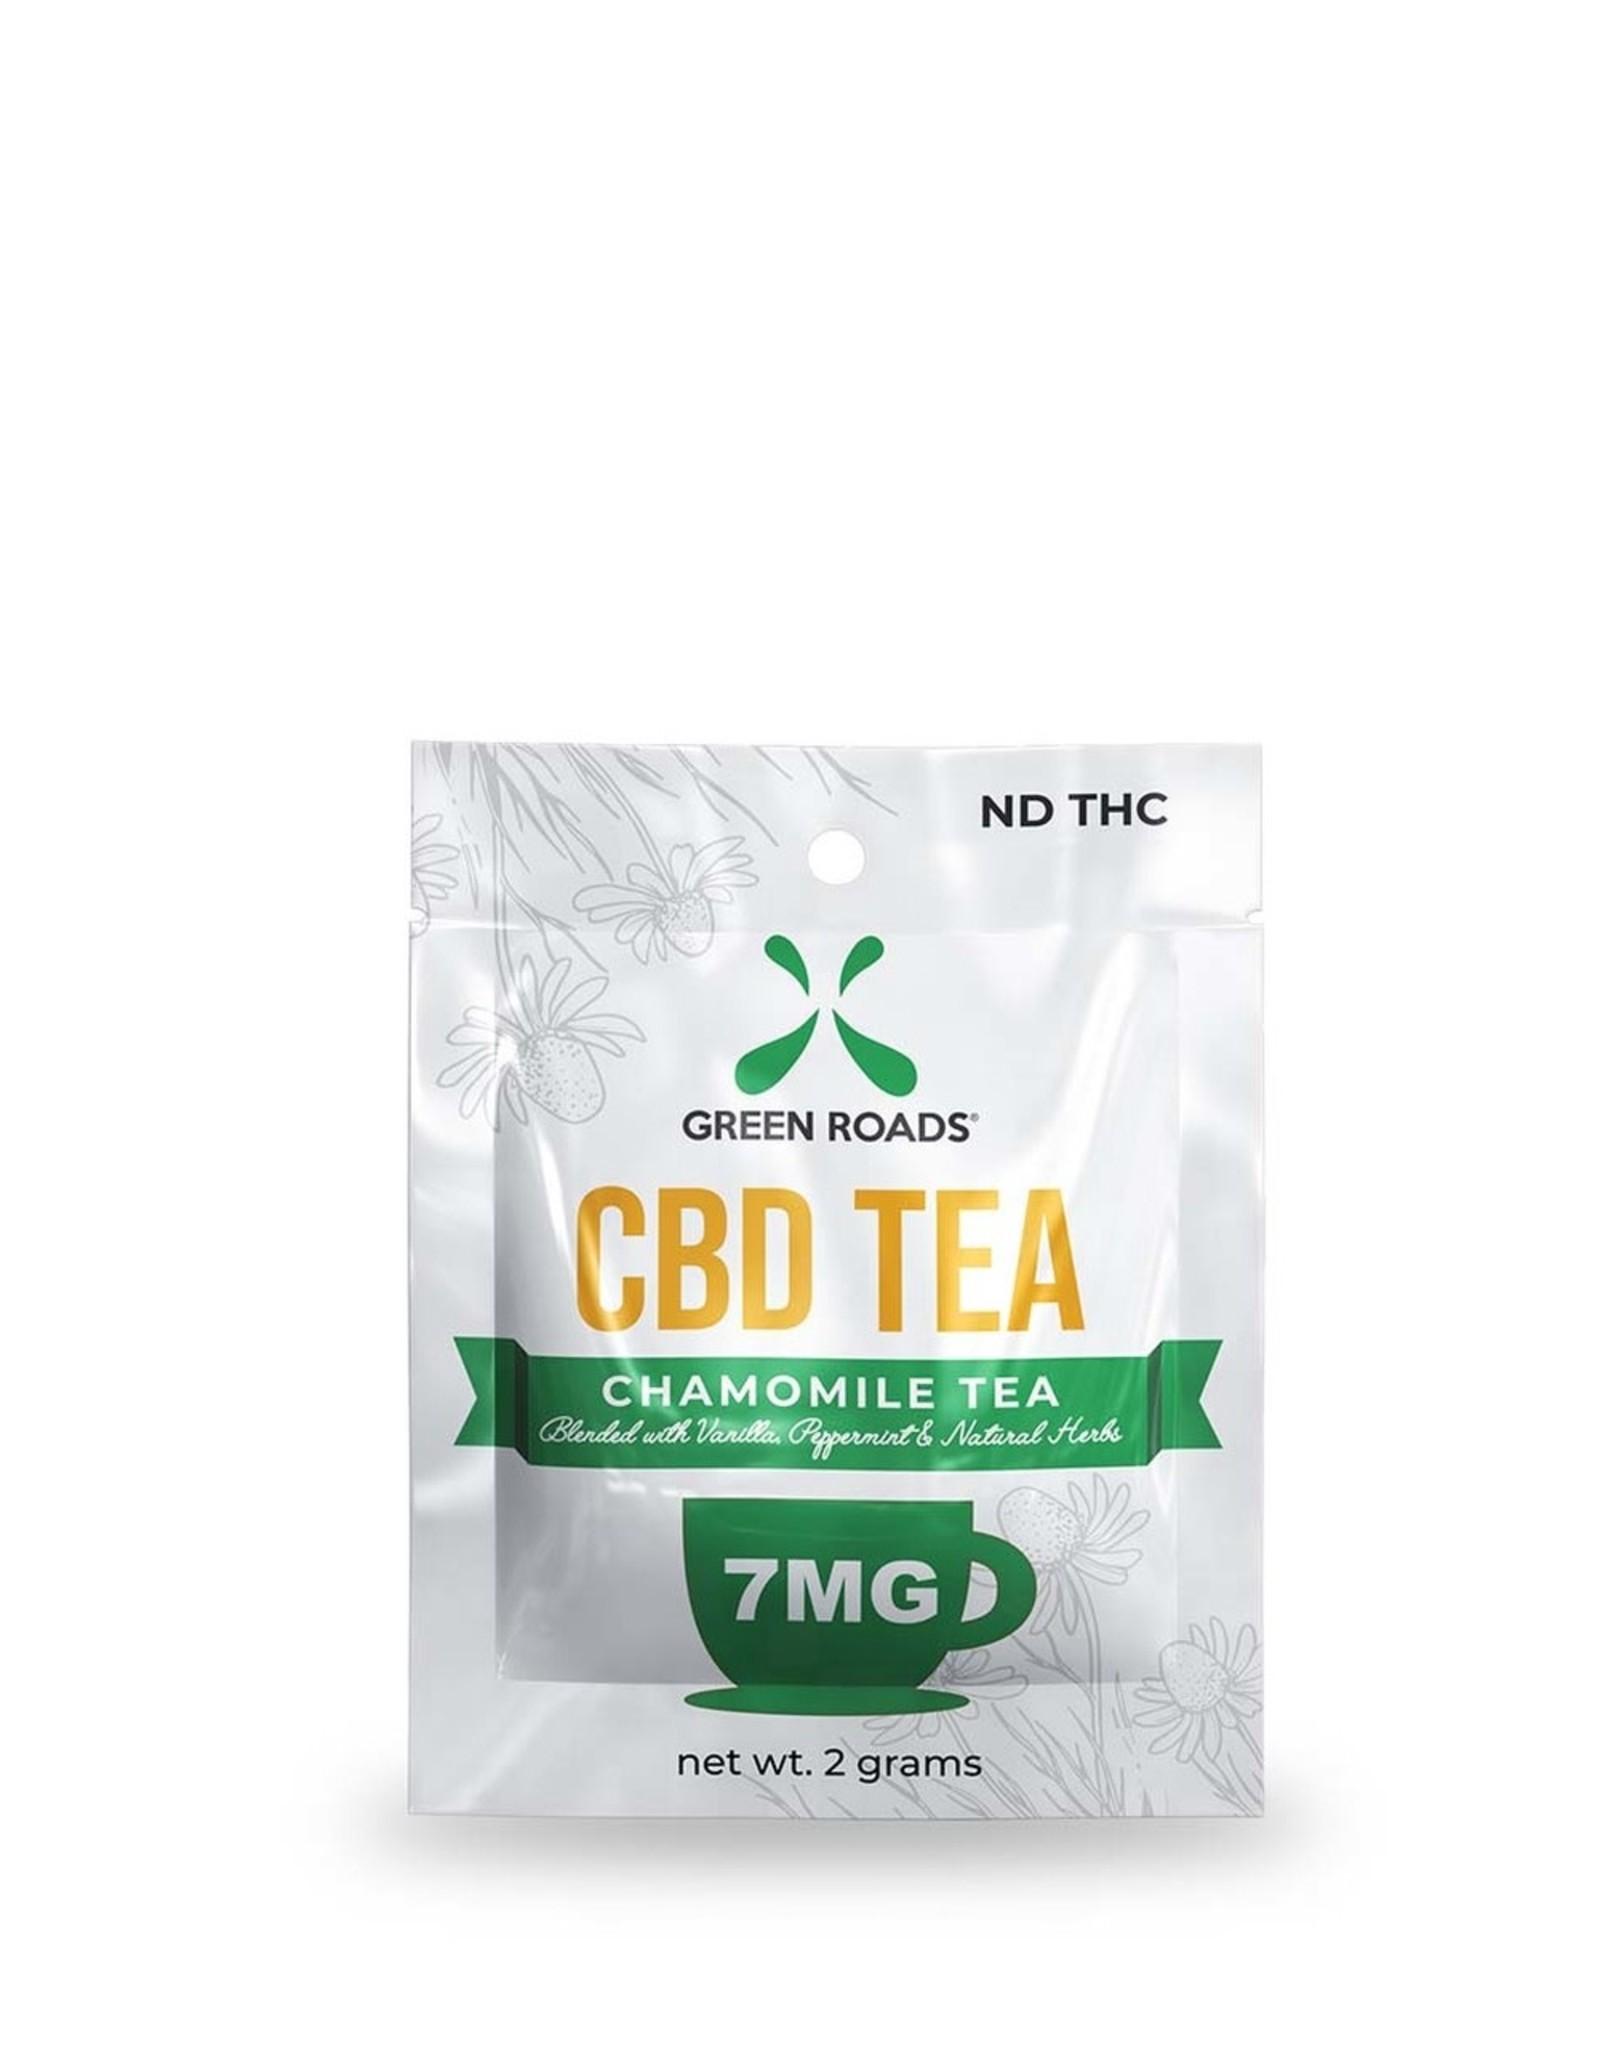 Green Roads Chamomile Tea